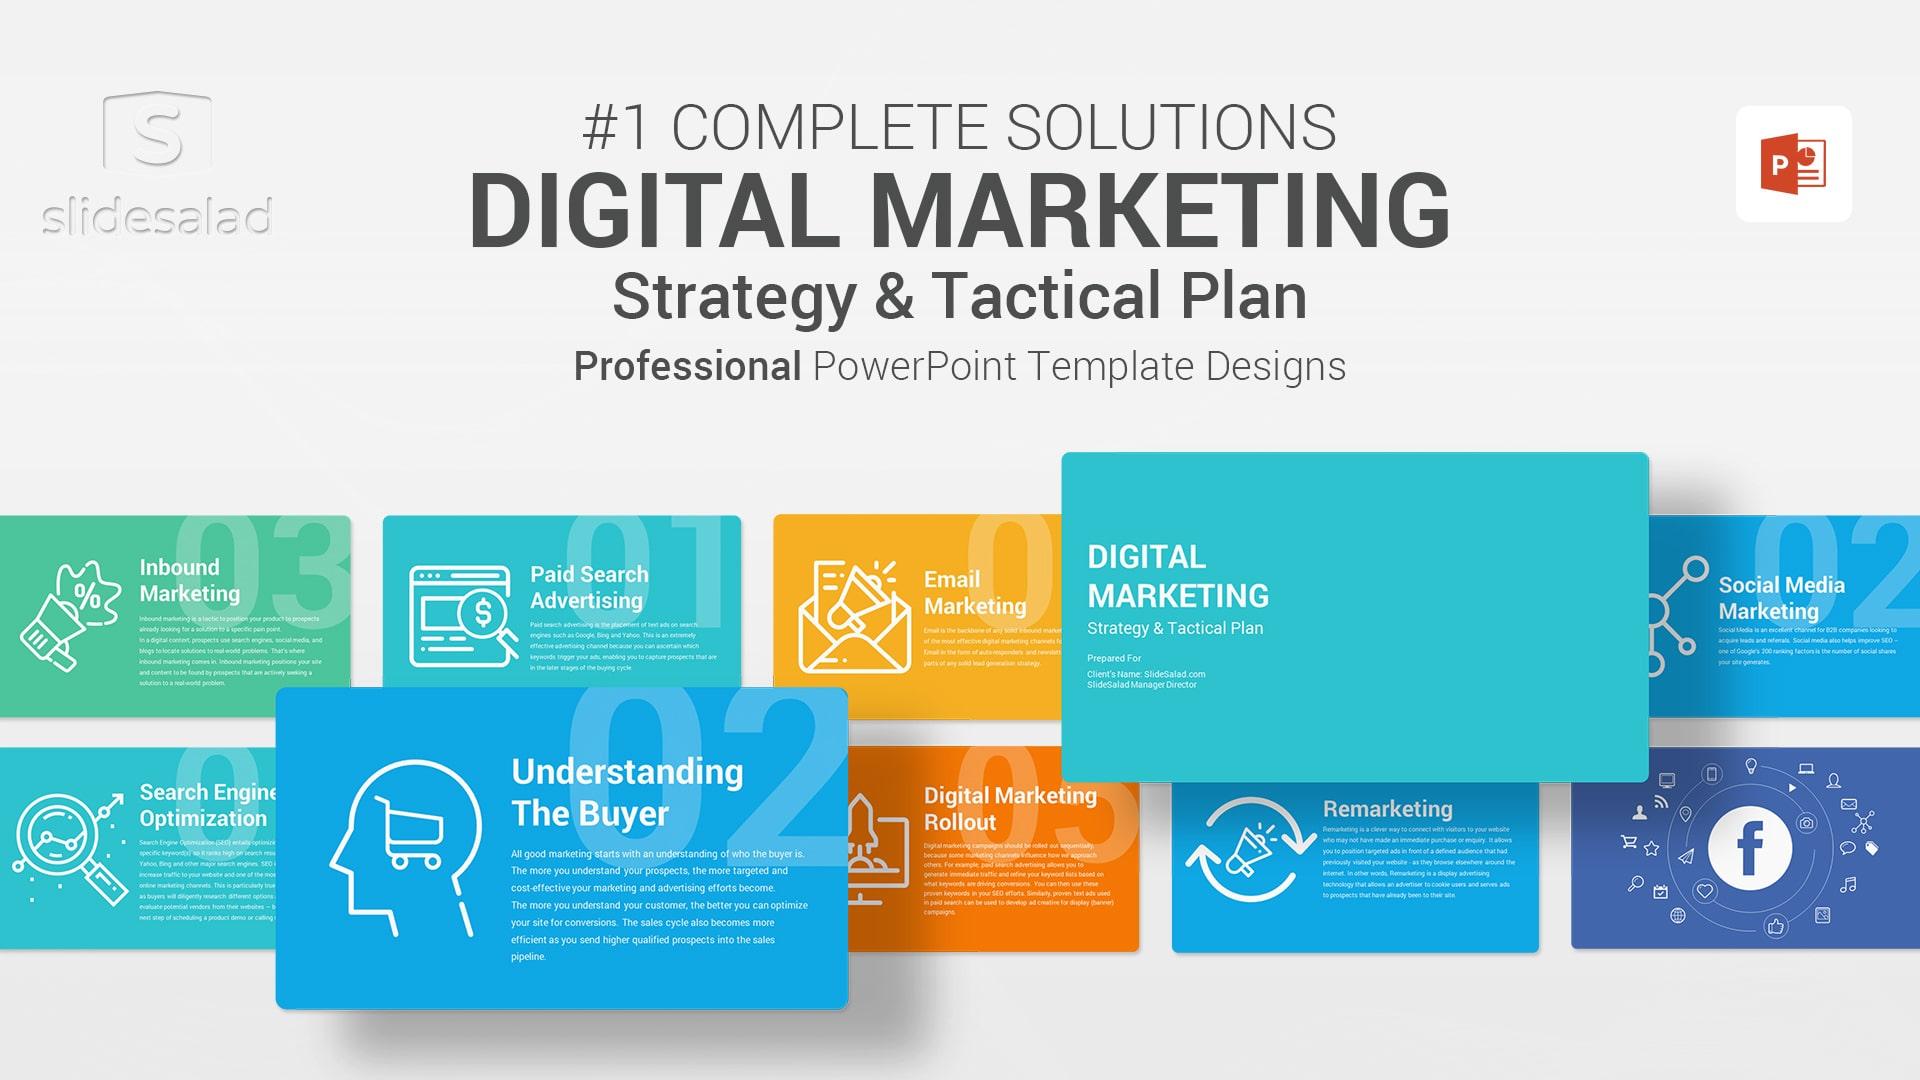 Digital Marketing PowerPoint (PPT) Template - Fully Customizable Online Marketing PPT Template Designs